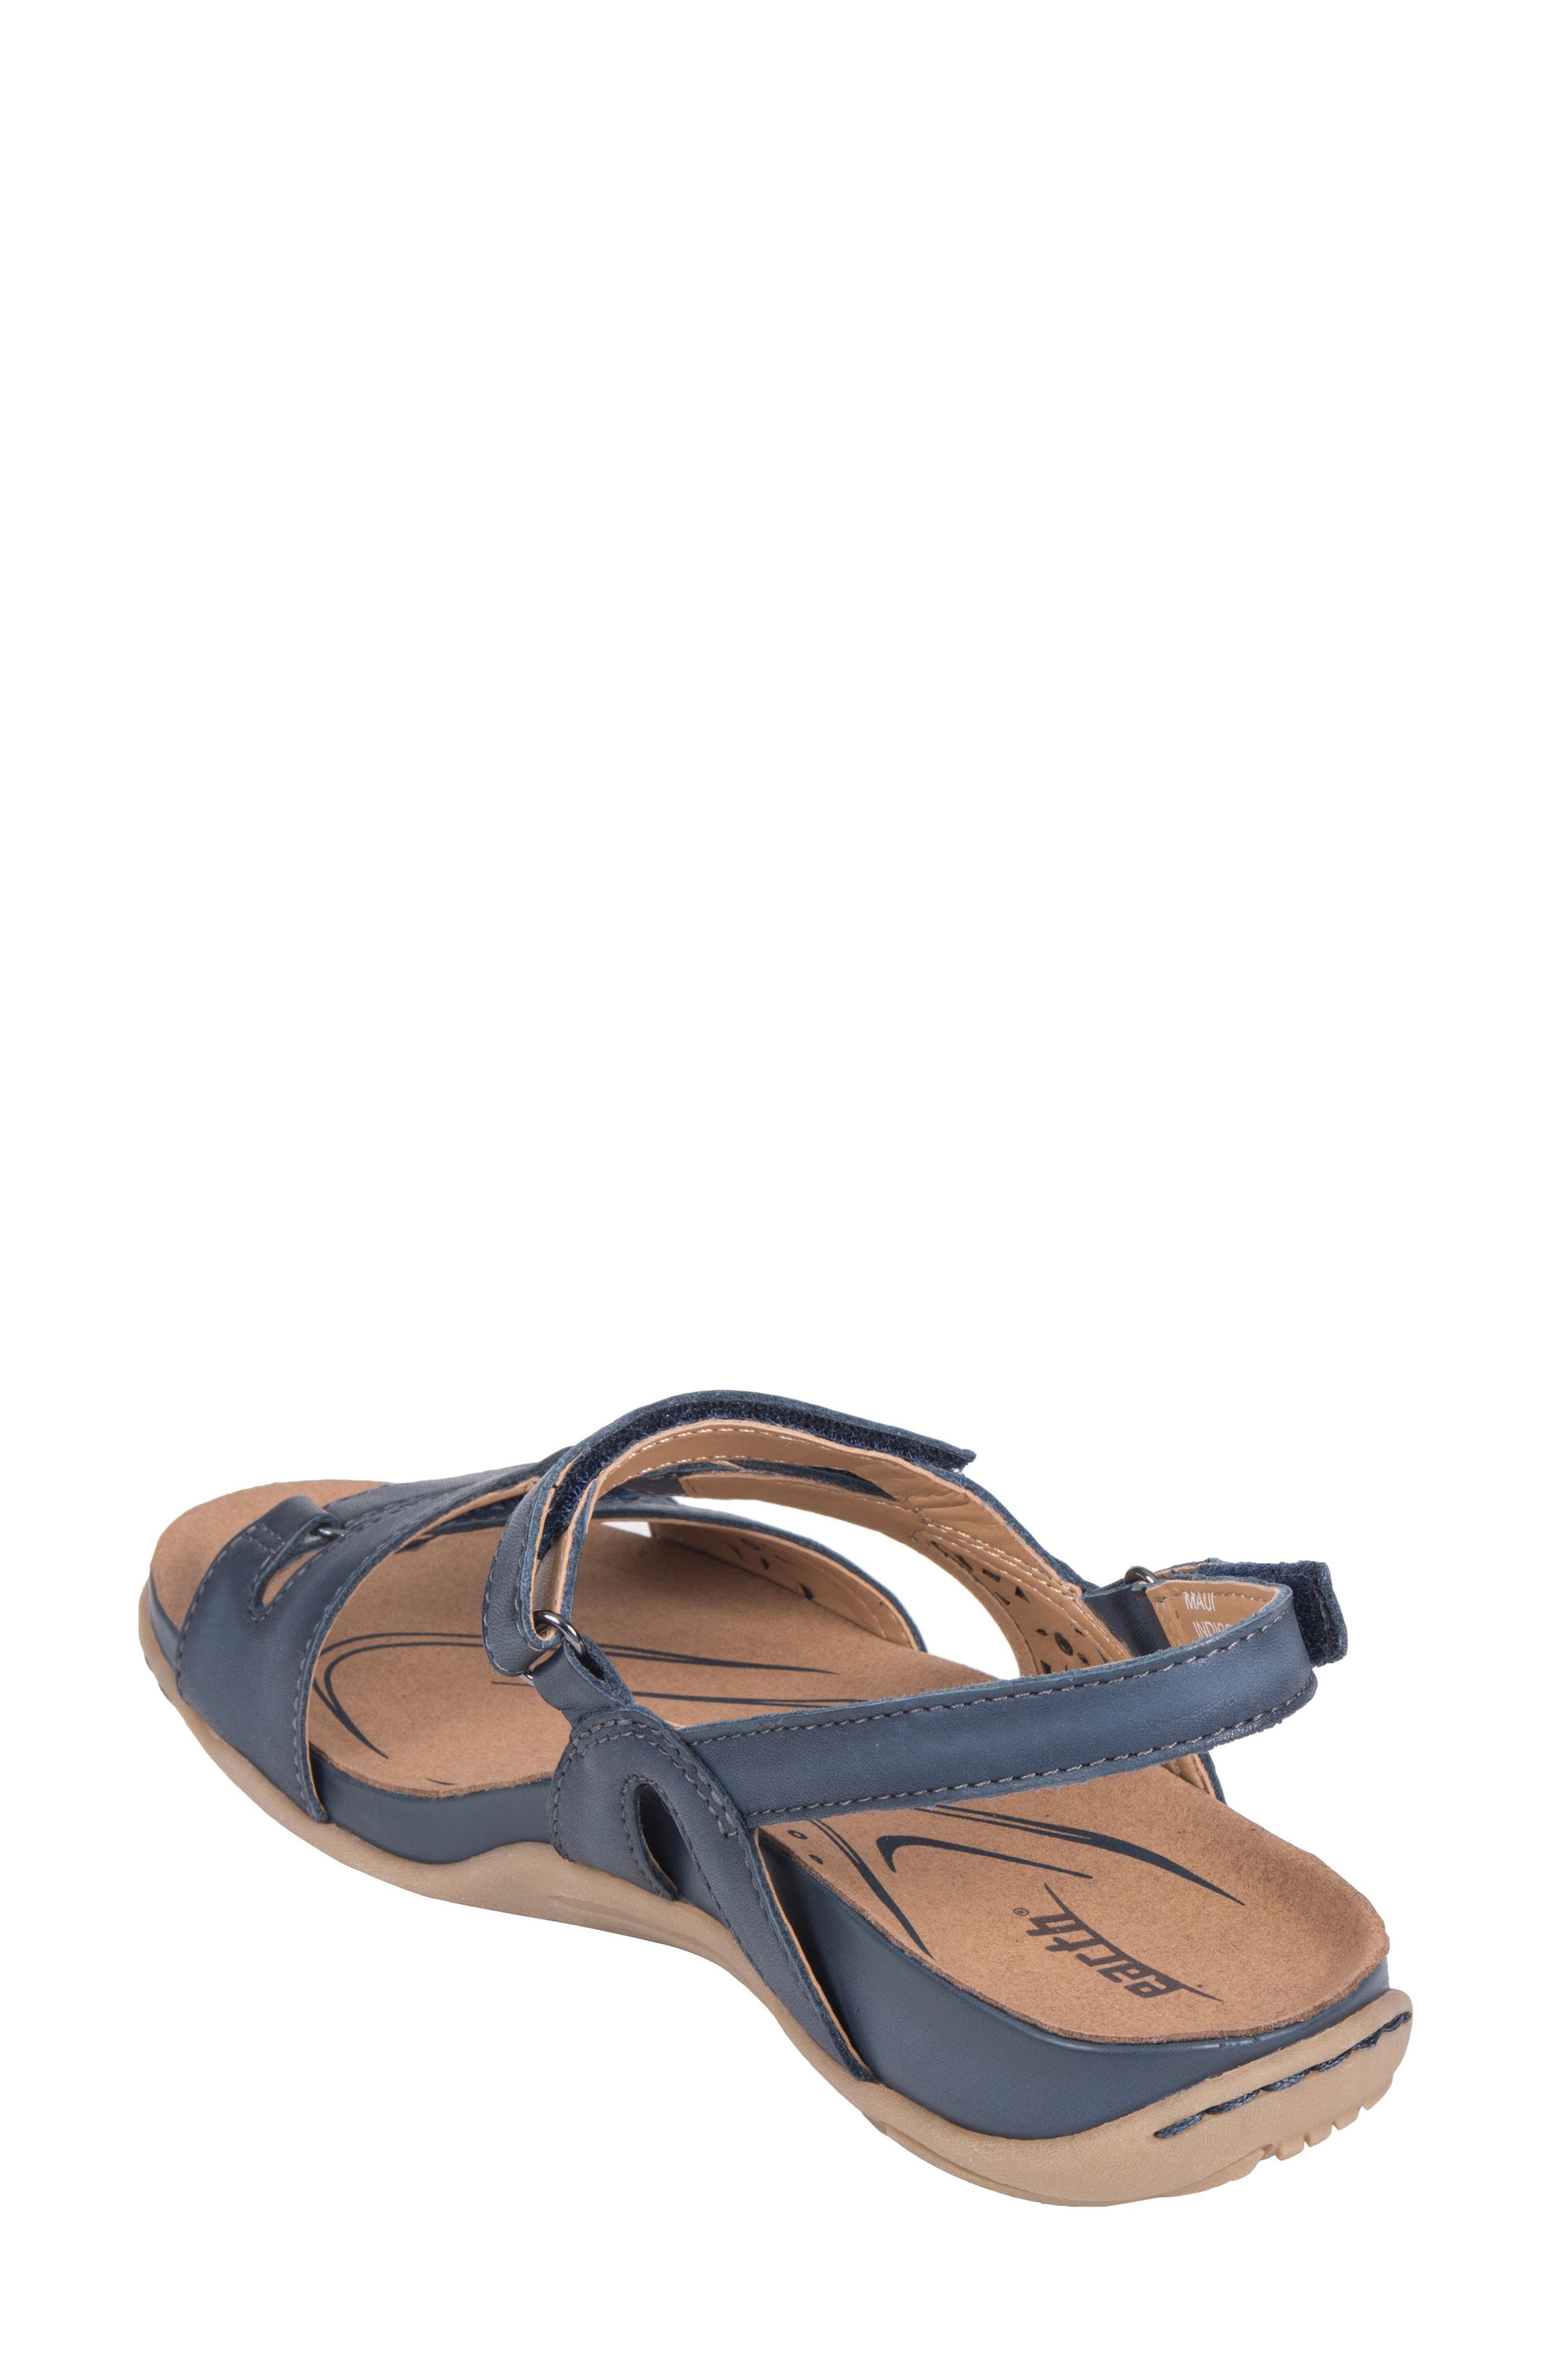 Maui Strappy Sandal,                             Alternate thumbnail 2, color,                             Indigo Blue Leather